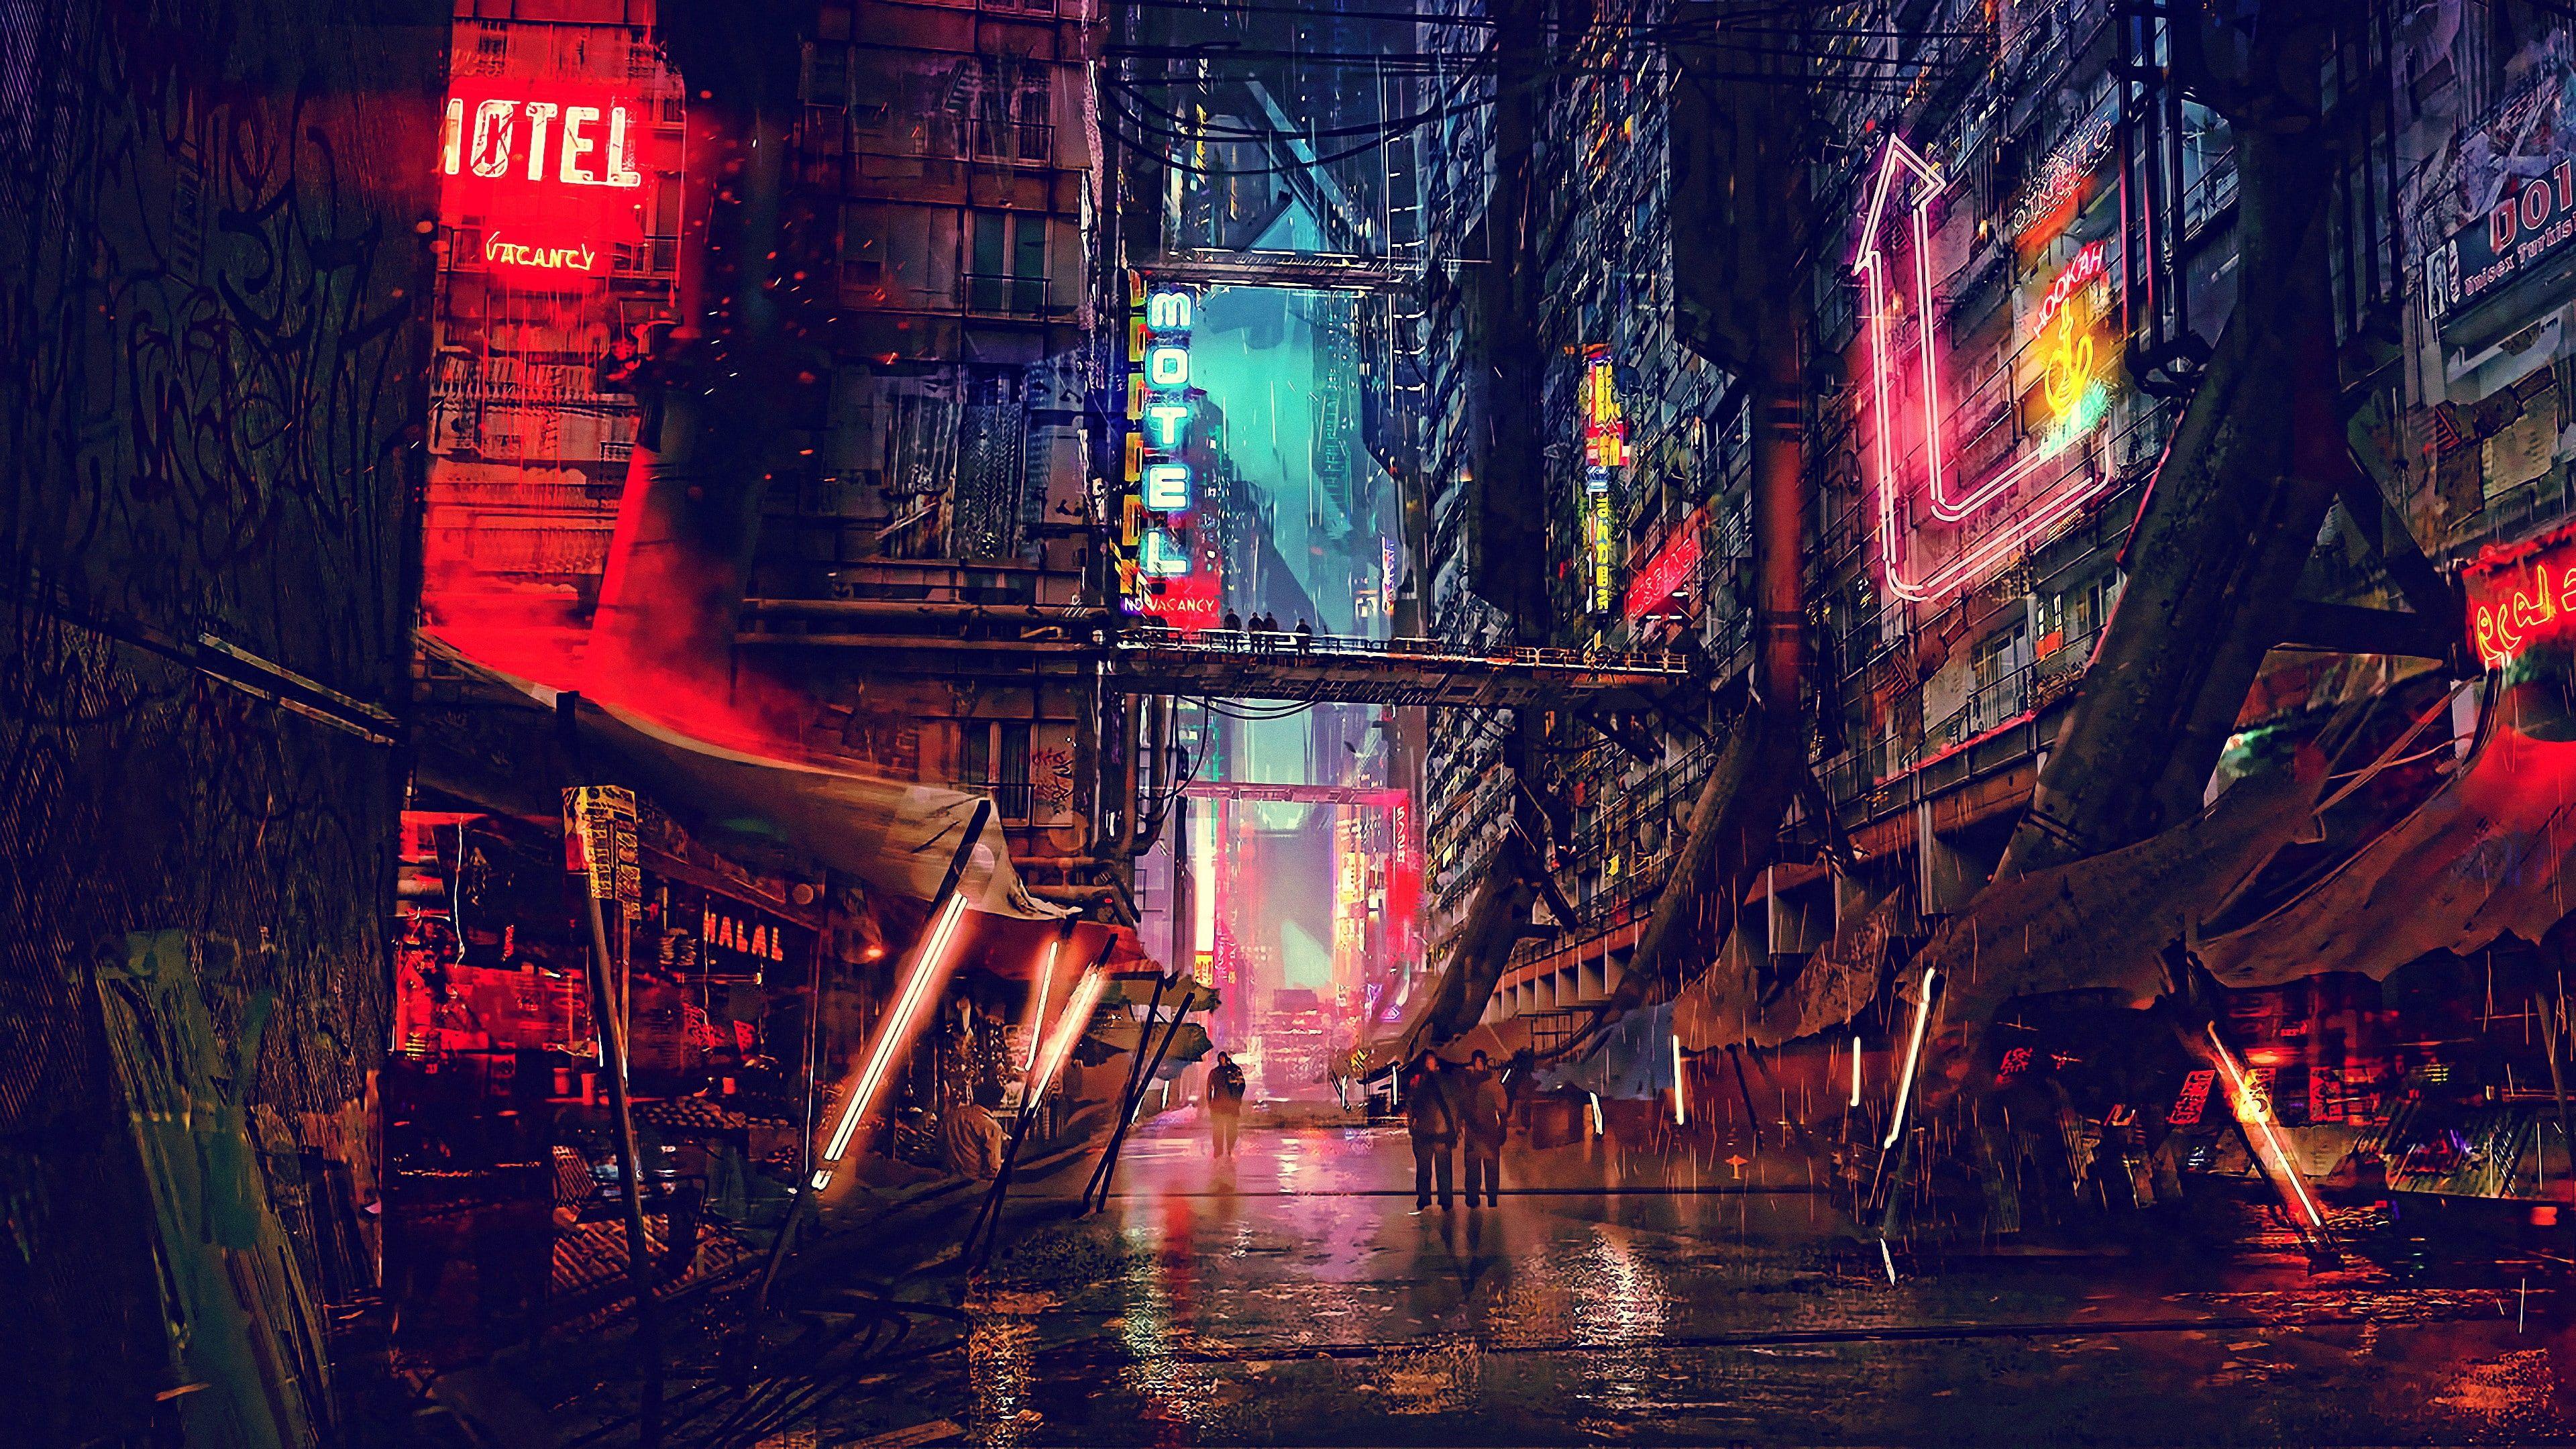 Street Art Artwork Digital Art Futuristic City Darkness Science Fiction Scifi Cyberpunk City Night Futuristic City Building Illustration City Wallpaper